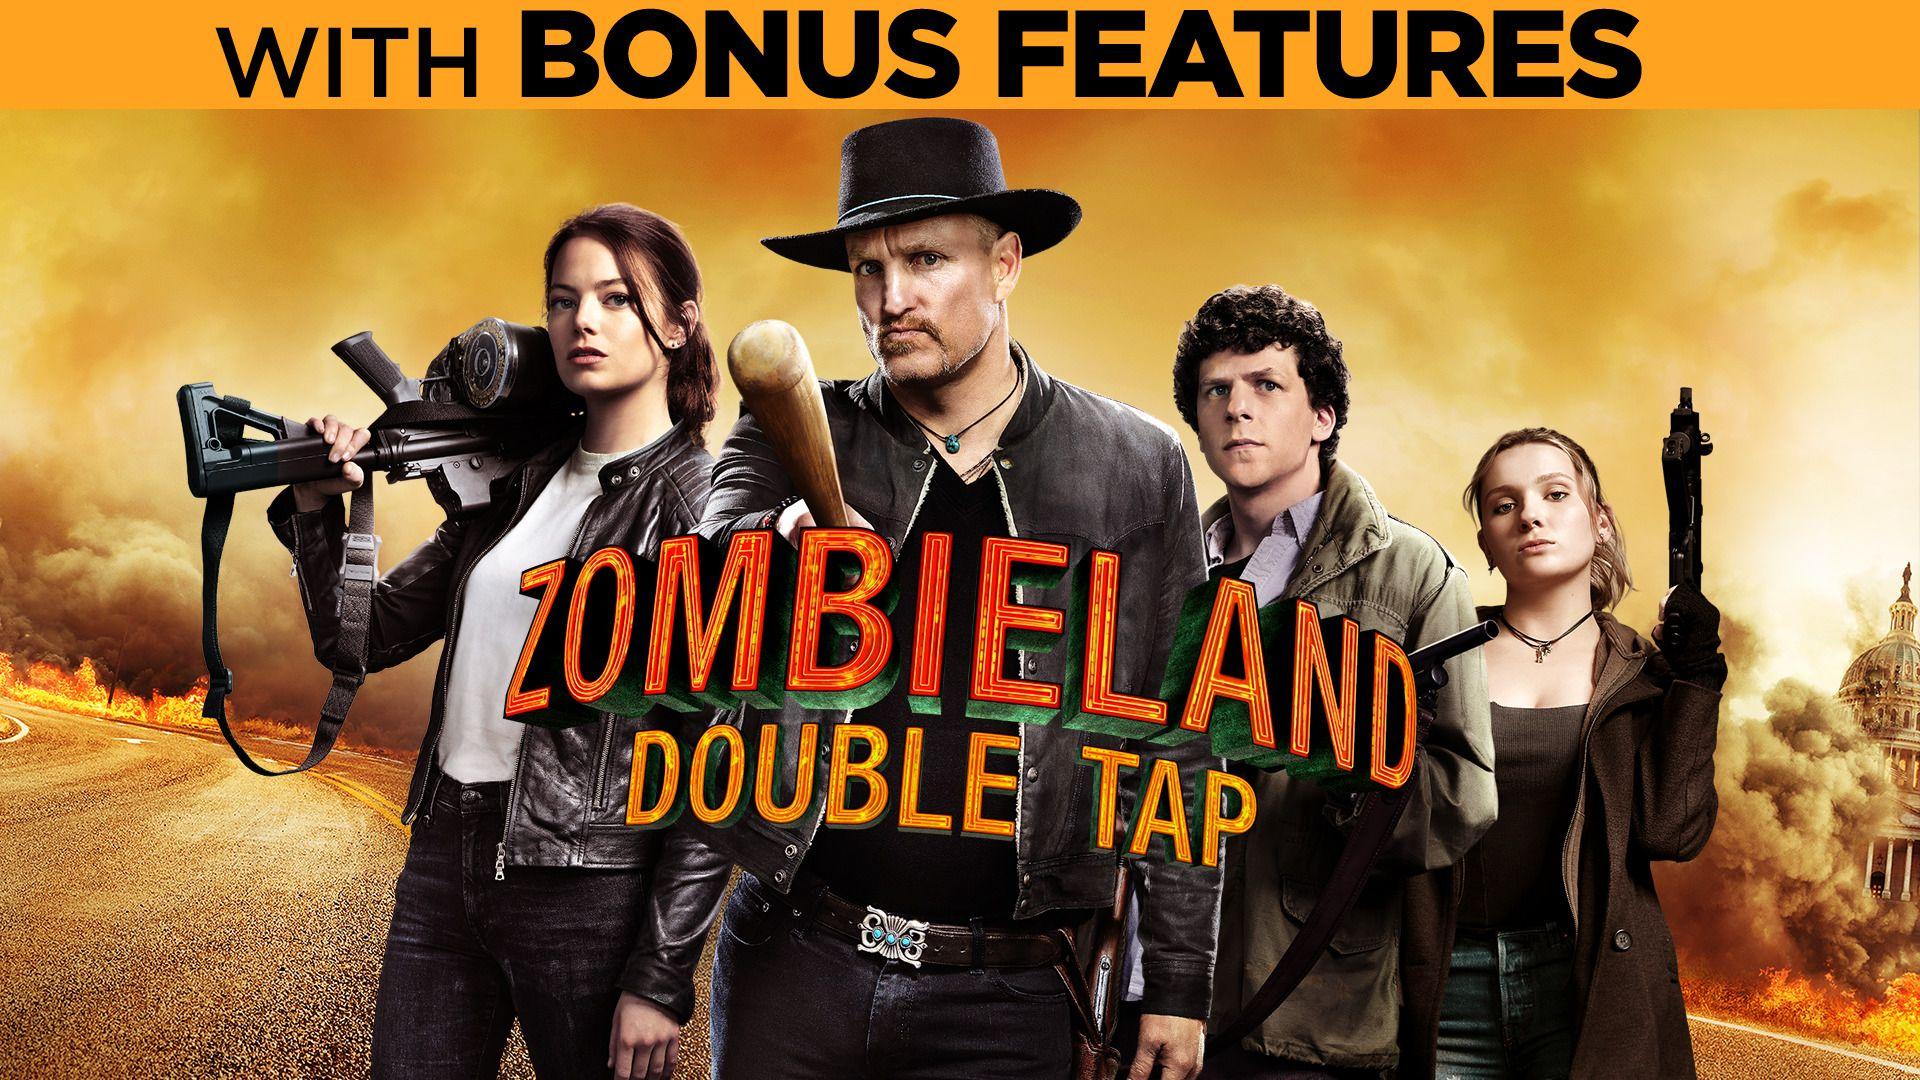 Zombieland: Double Tap (With Bonus Features)